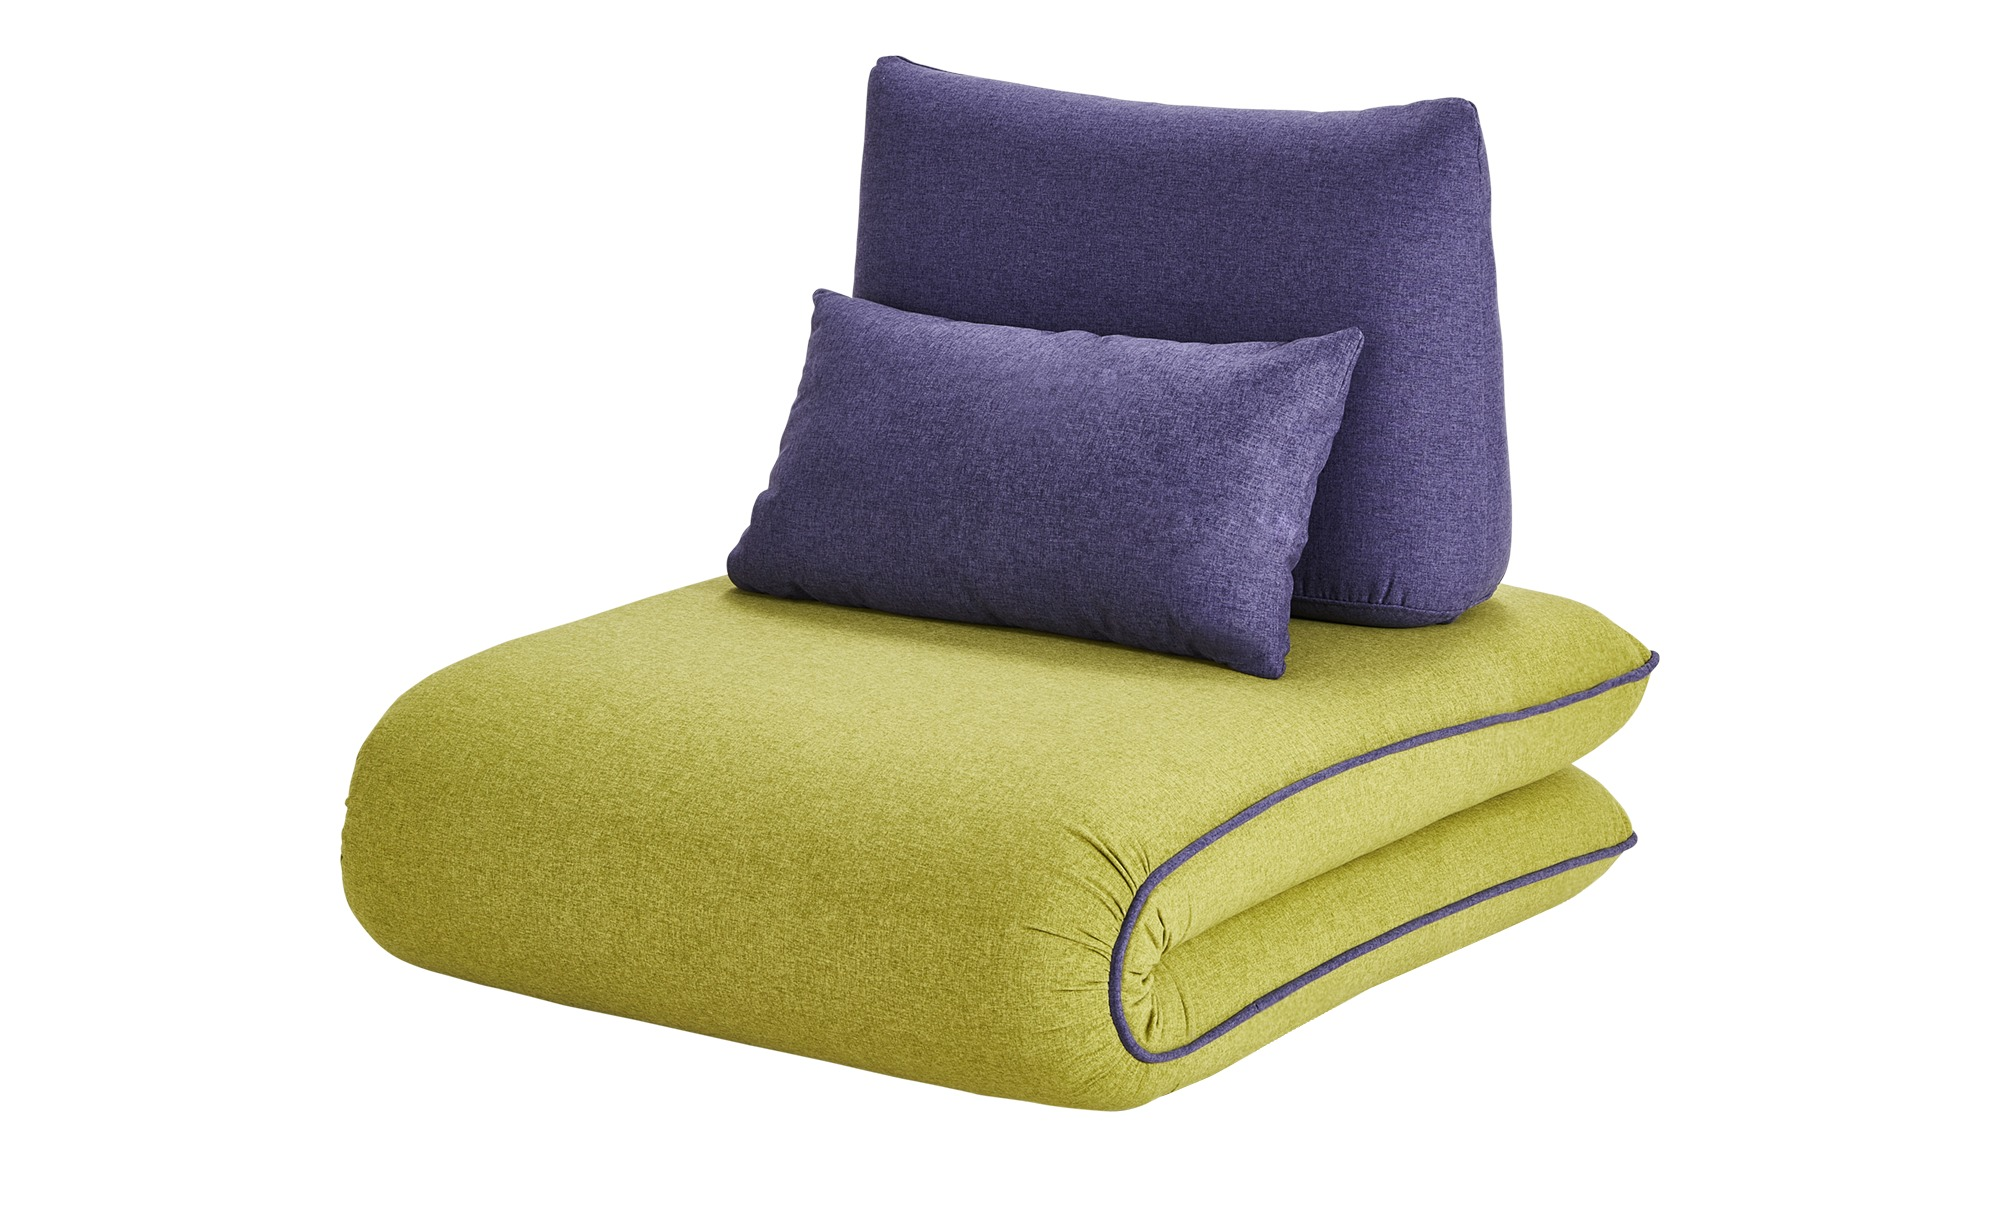 Schlafsessel grün - Stoff Beatrix ¦ grün ¦ Maße (cm): B: 82 H: 73 T: 98 Polstermöbel > Sessel > Schlafsessel - Höffner